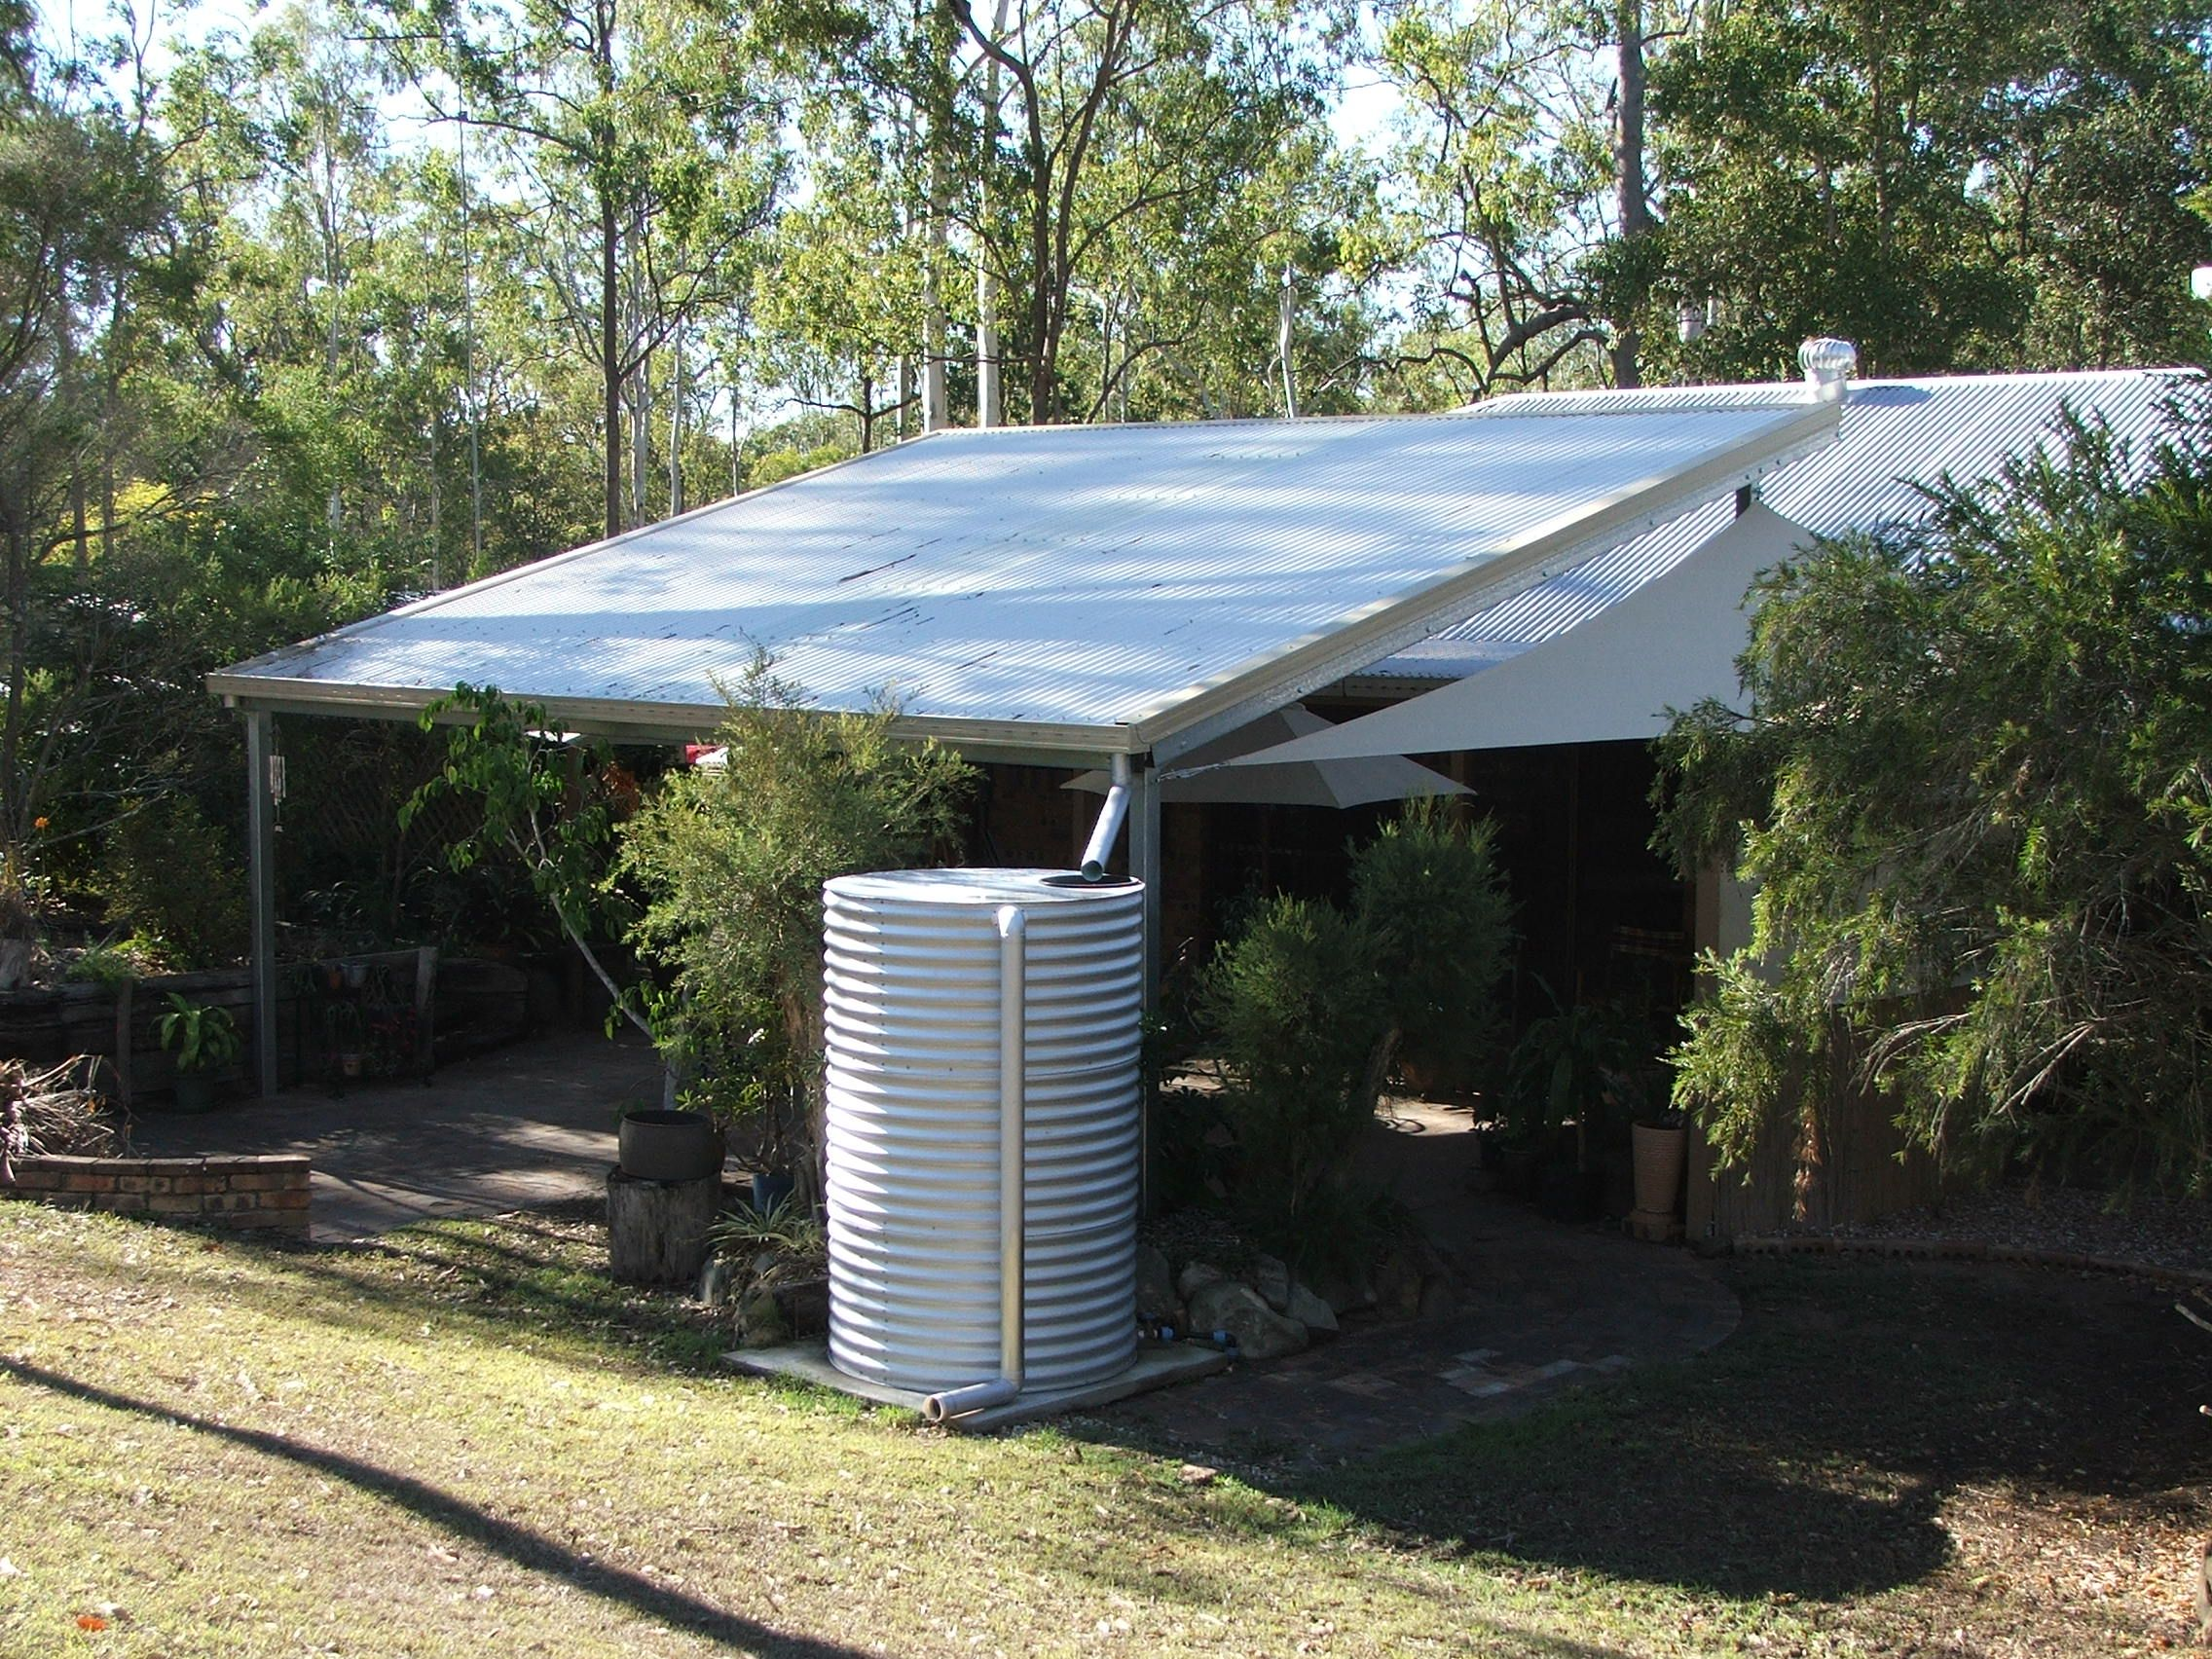 Carports Skillion roof, Carport designs, Carport